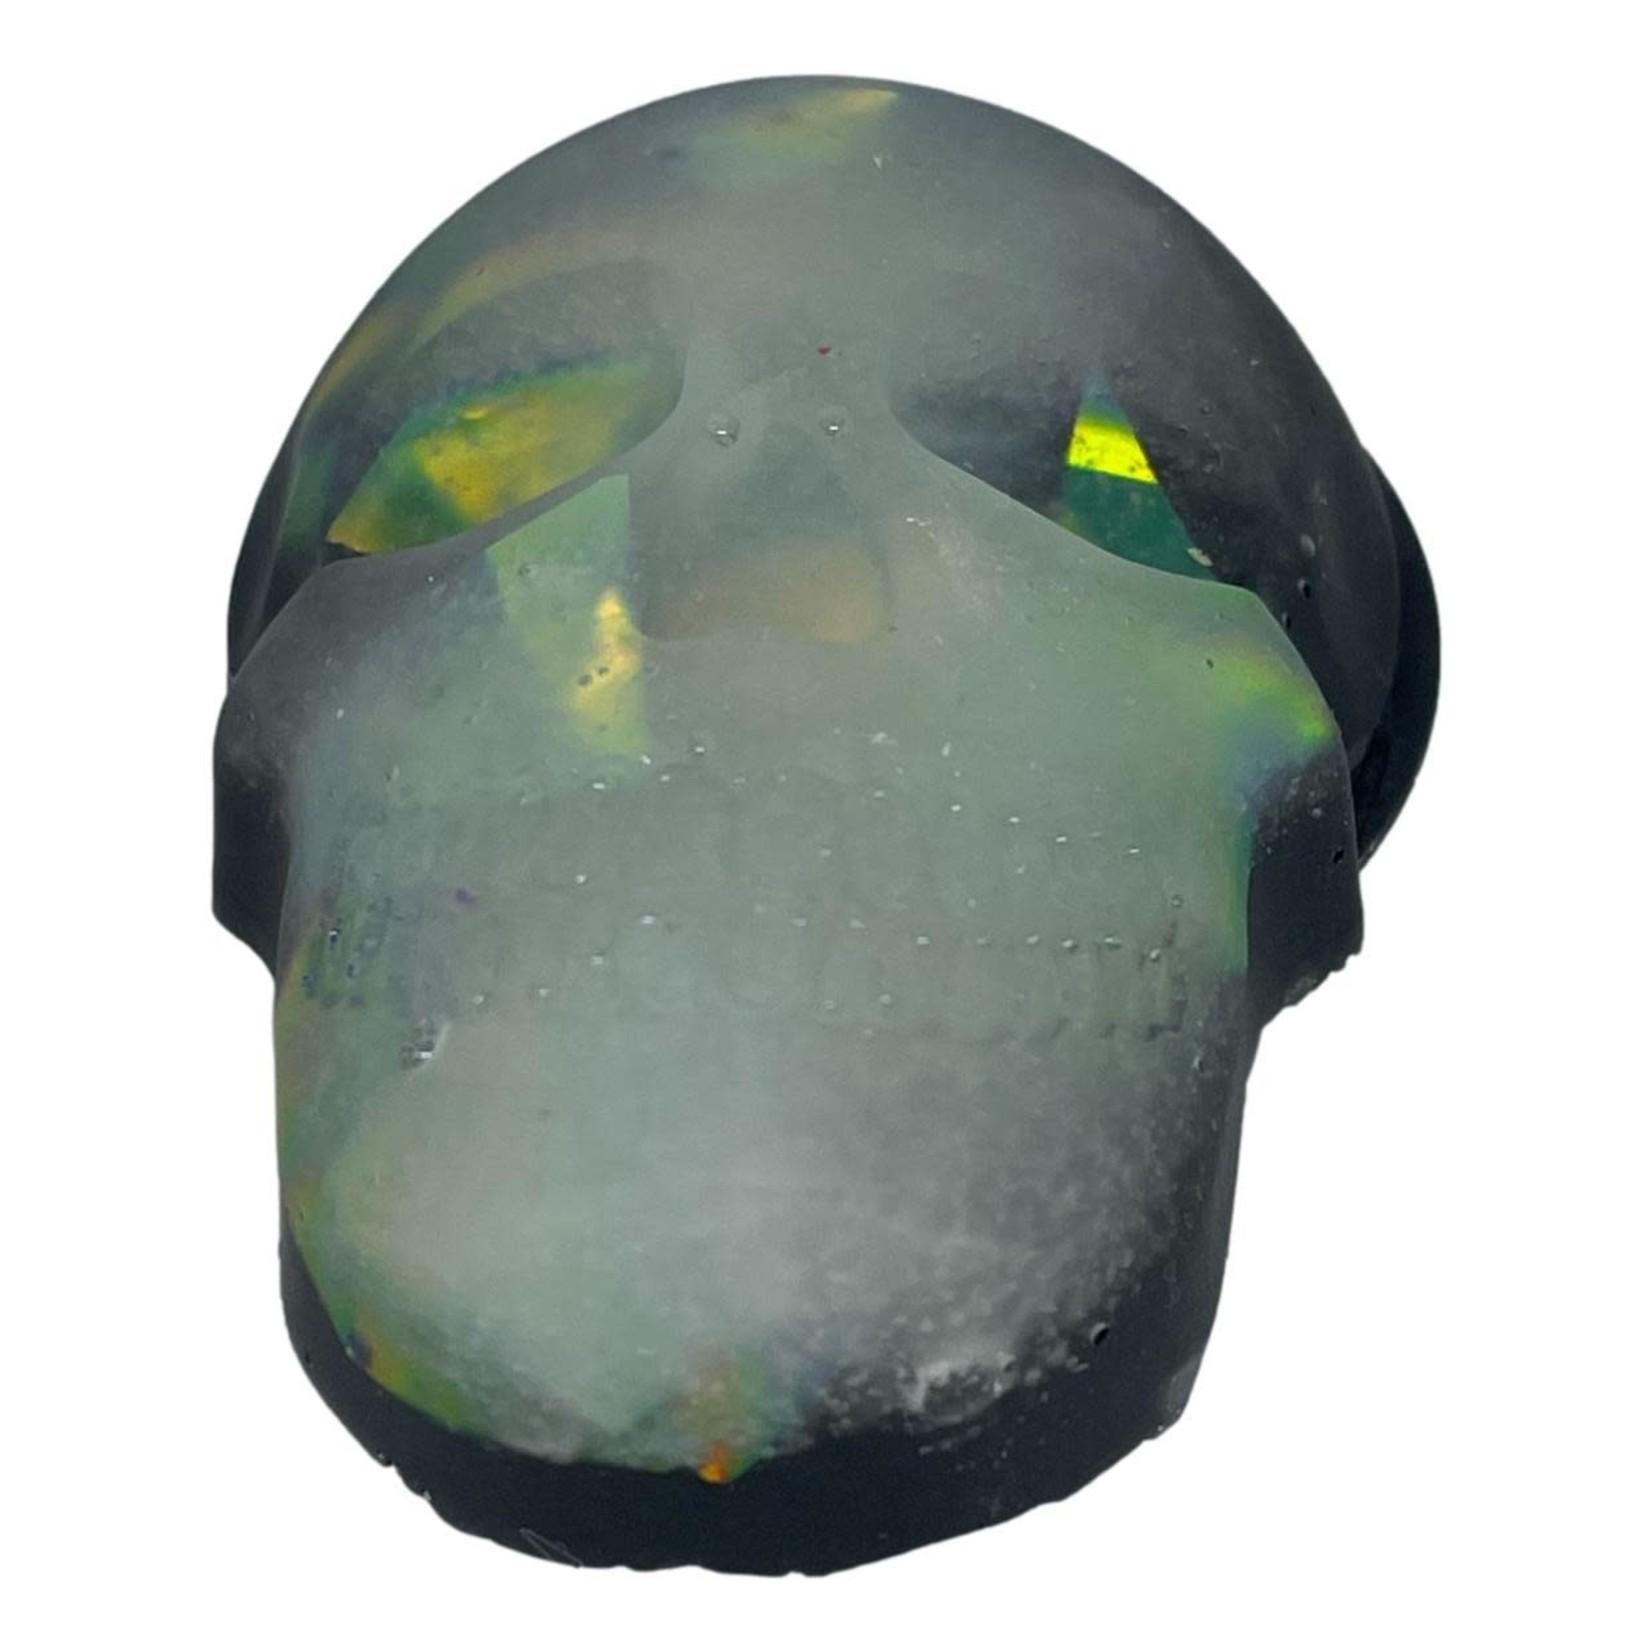 East Coast Sirens Holographic 3D Skull Phone Grip